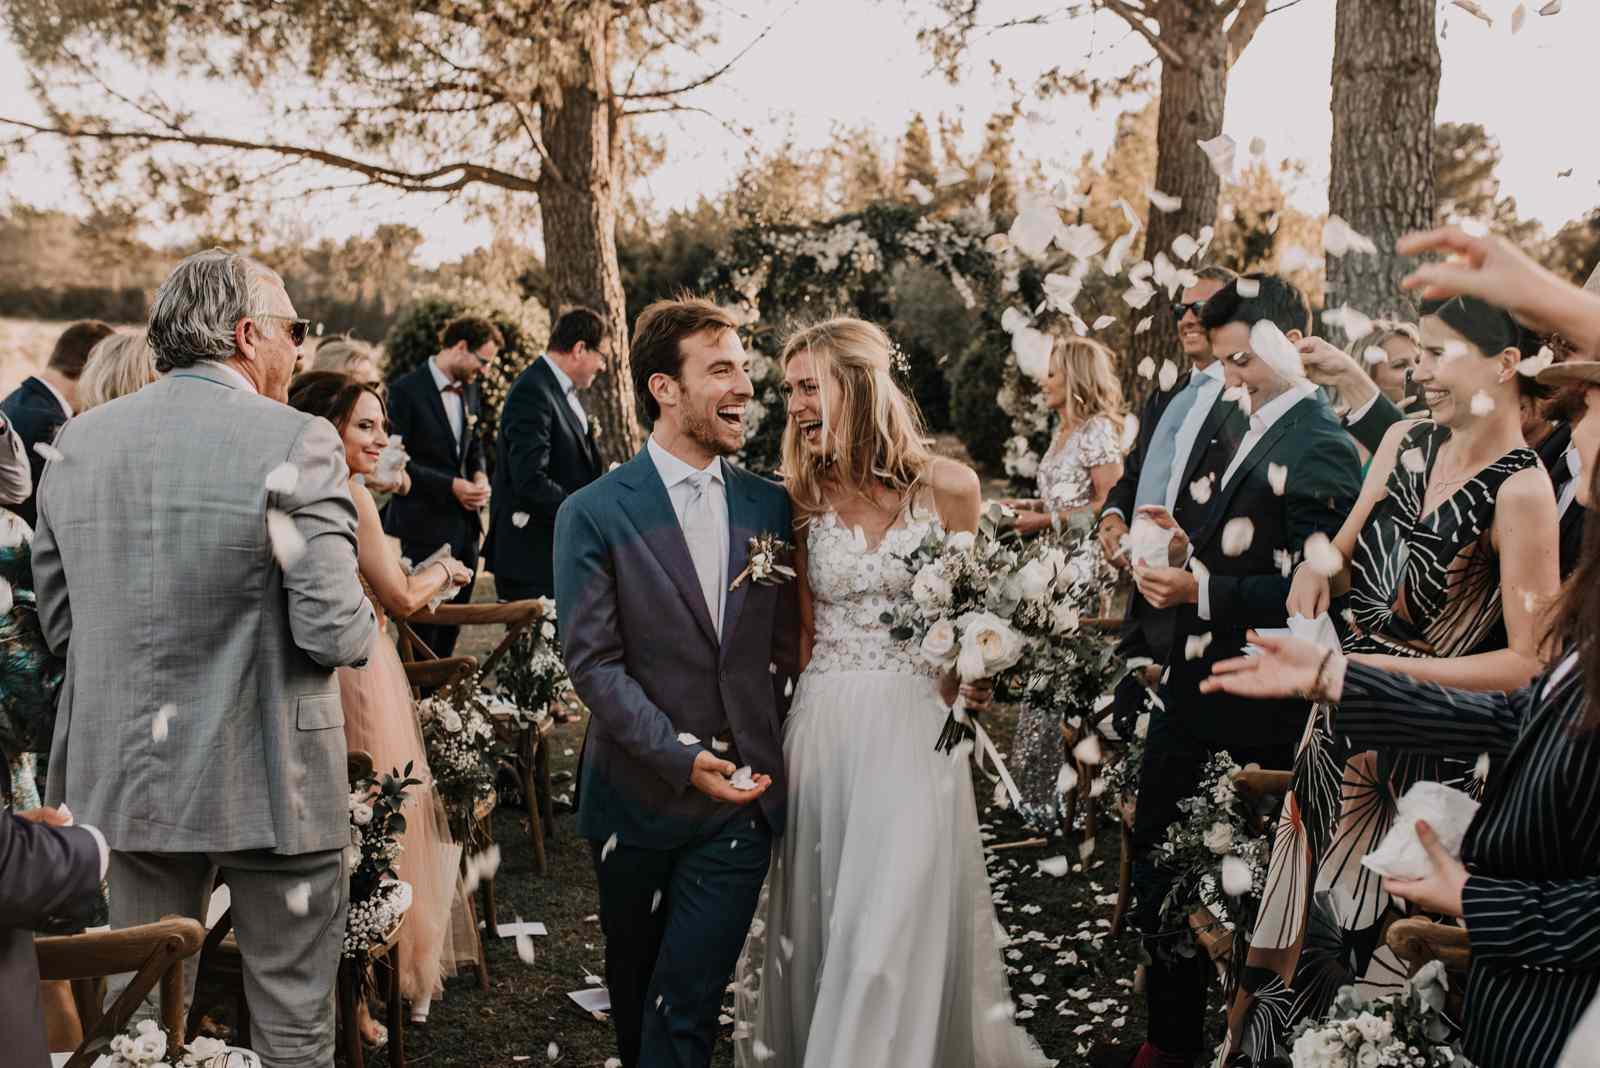 Bride and groom walk back up aisle as people throw flower petals